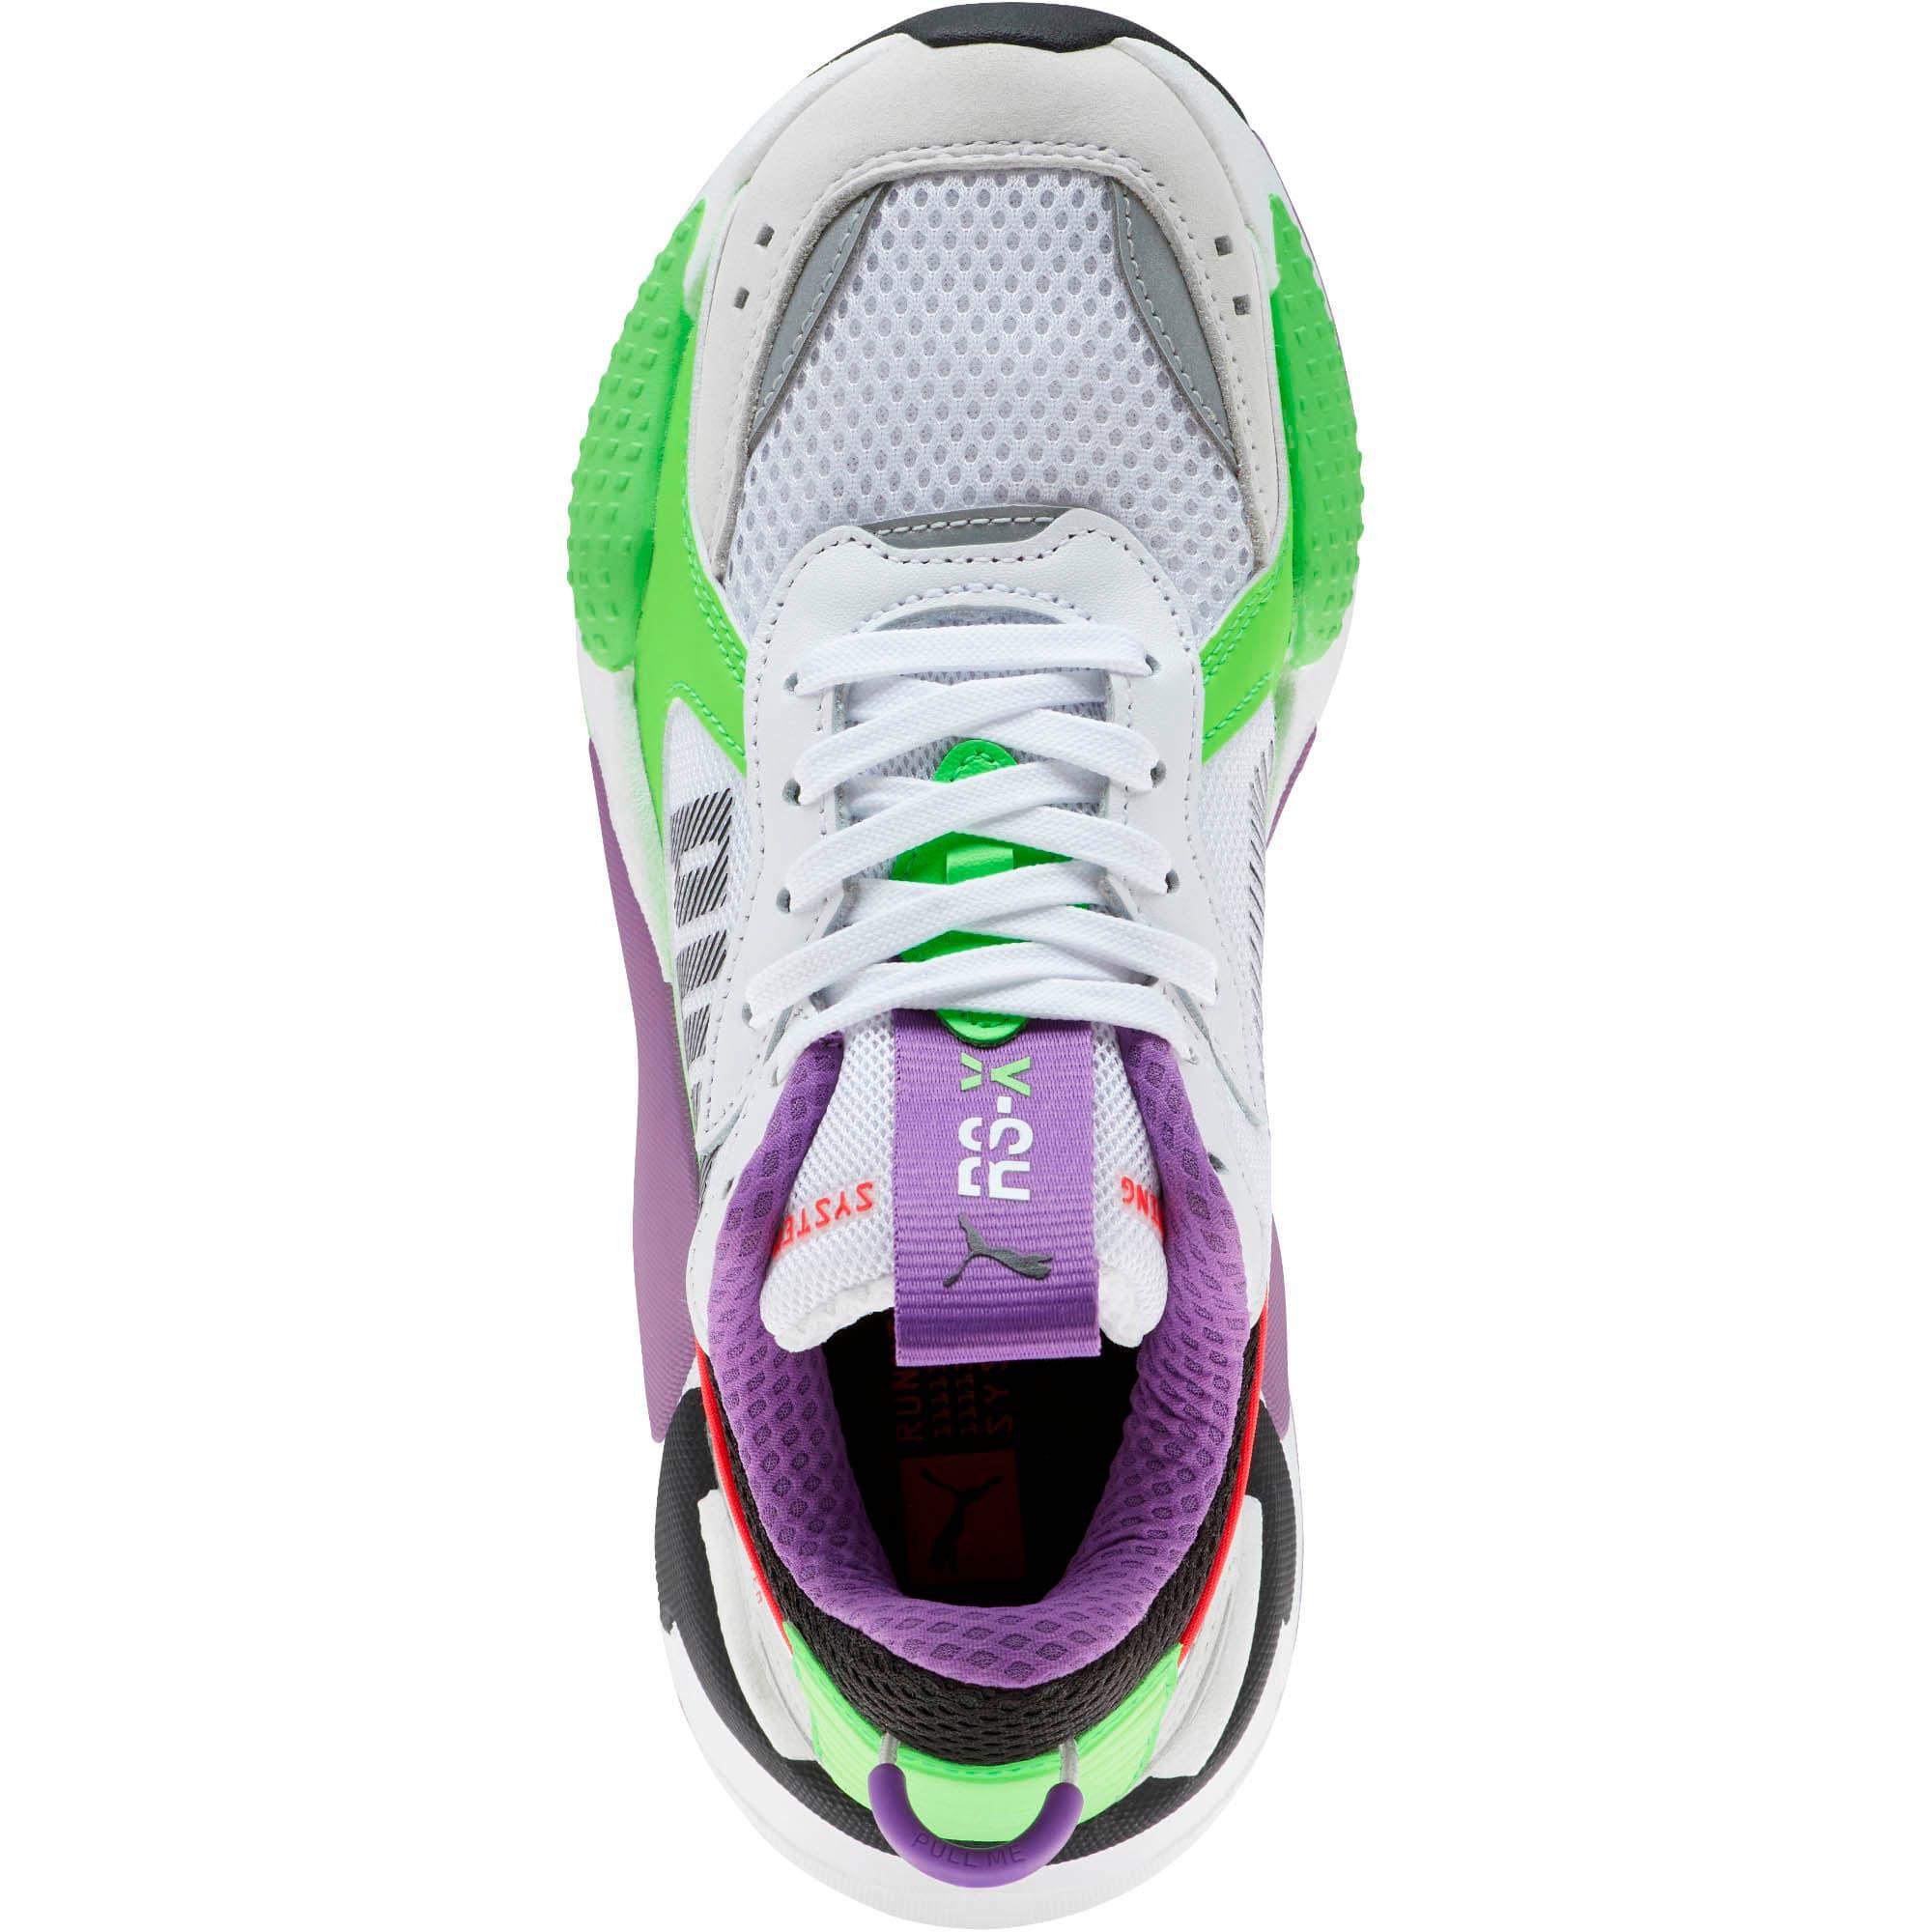 Thumbnail 5 of RS-X Bold Fluorescent Sneakers JR, PWhite-Gr Gecko-Royal Lilac, medium